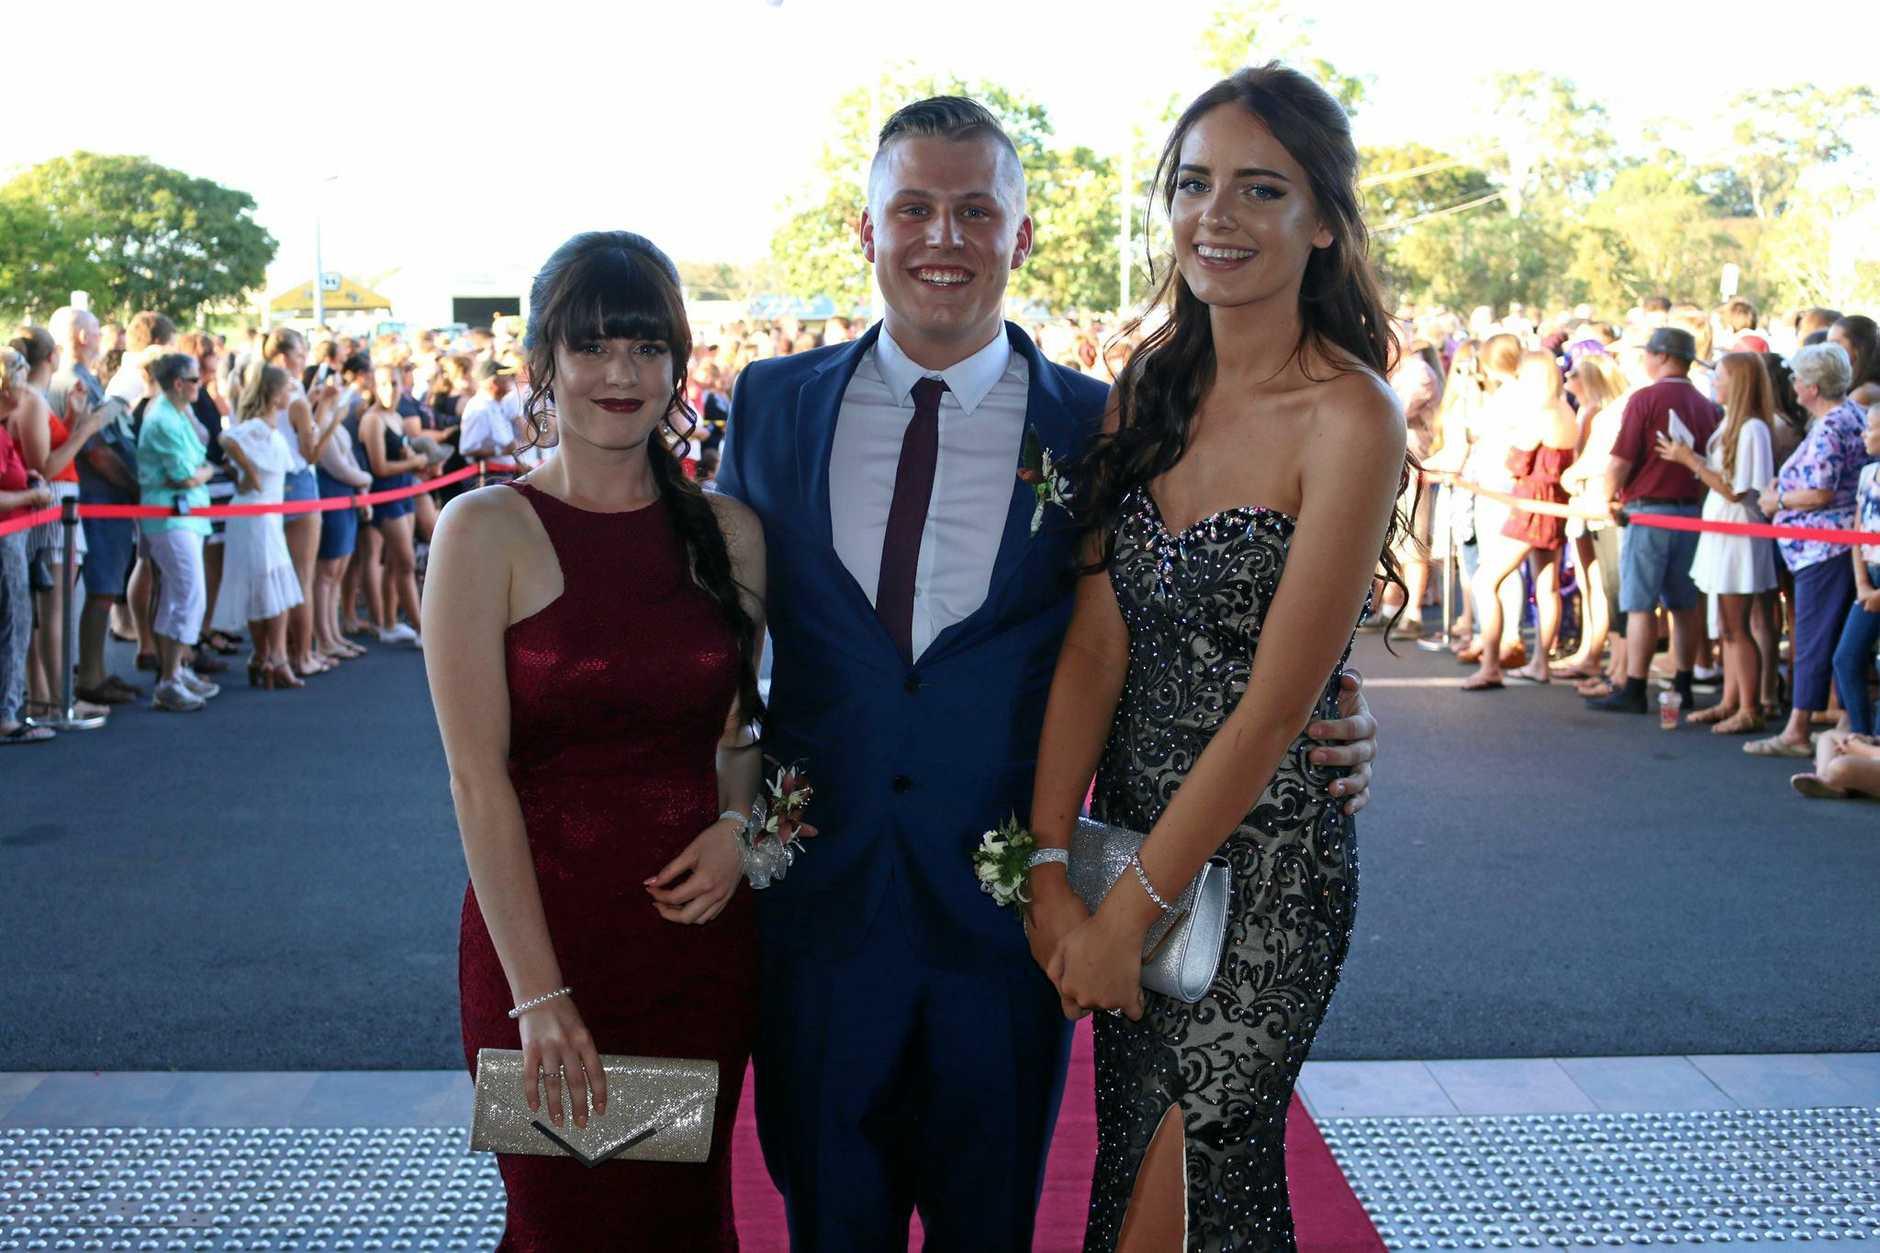 Olivia Jones, Bailey Dalgleish and Chloe Mann at the 2016 Lockyer District High School formal.